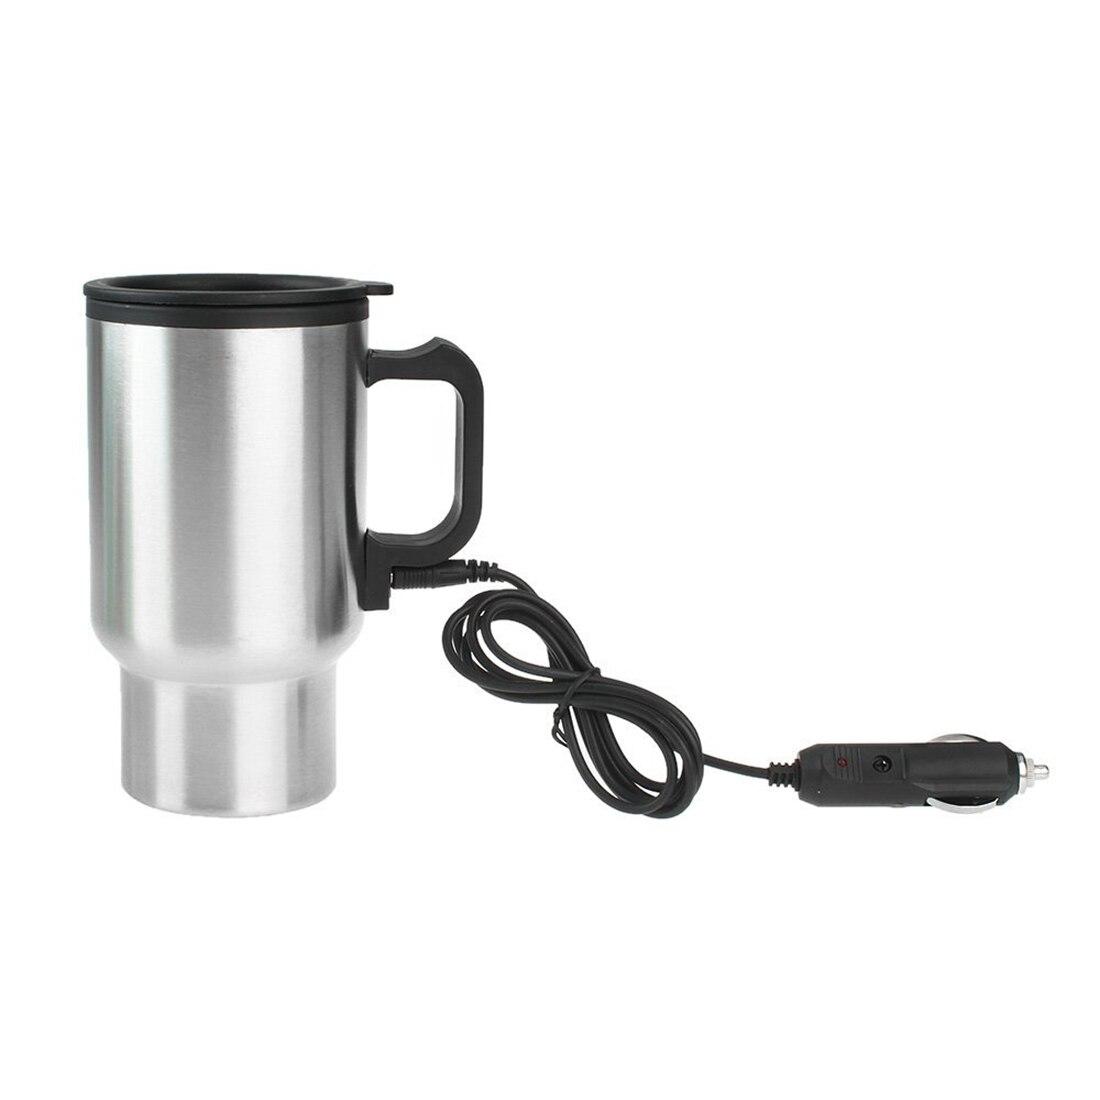 Dewtreetali Practical car styling DC 12V Car 450ml Drink Coffee Water Milk Stainless Steel Bottle Warmer